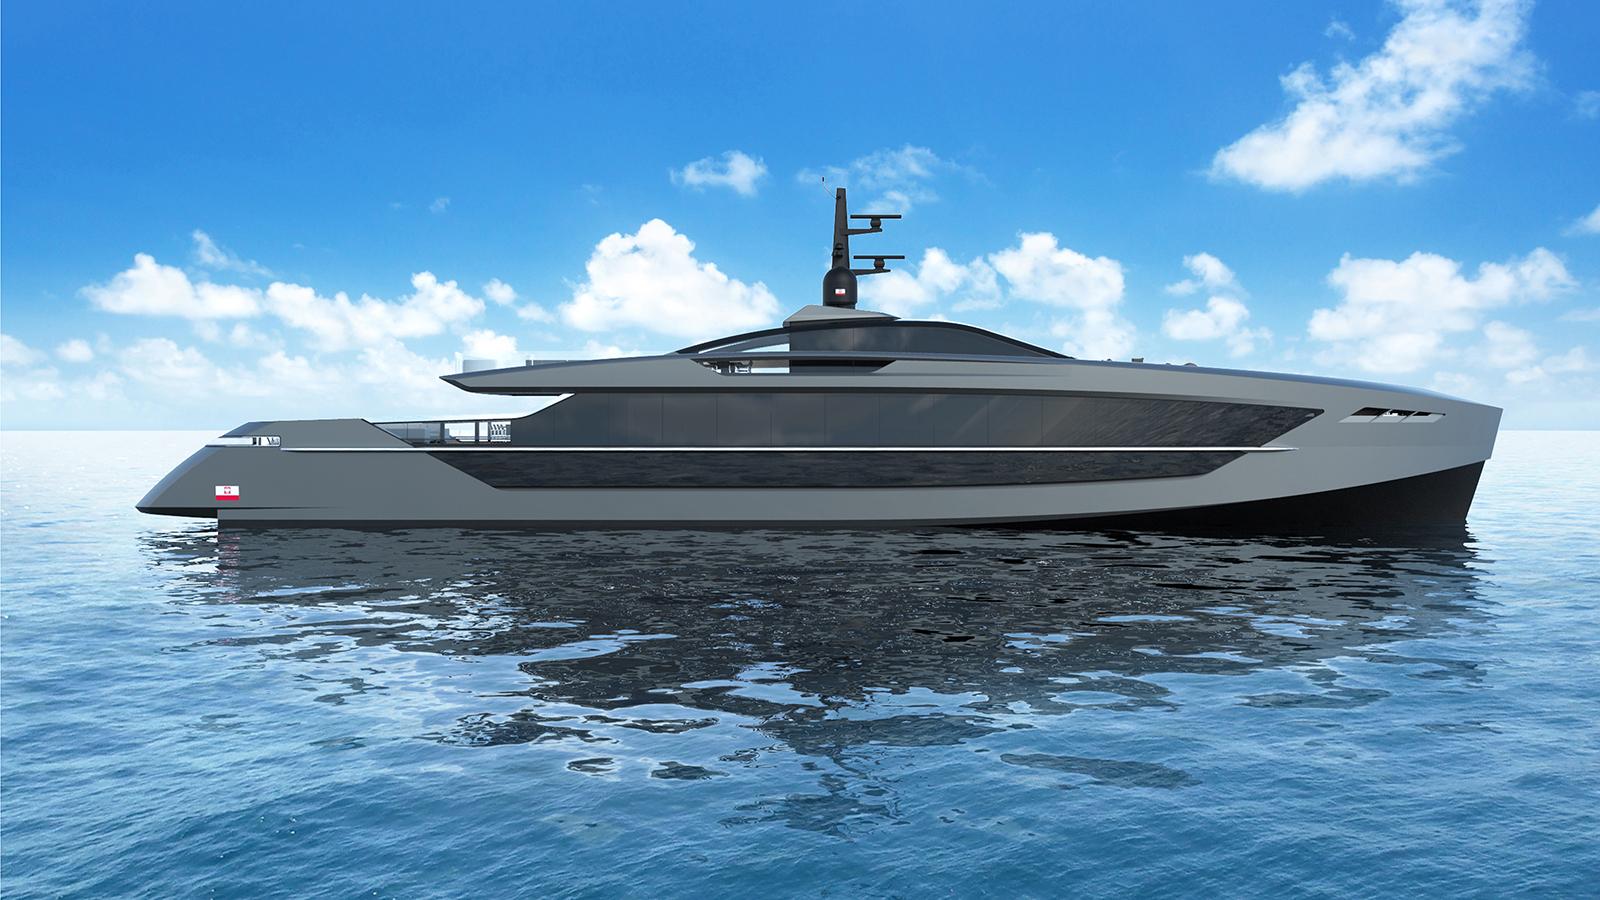 side-view-of-the-53-metre-tankoa-motor-yacht-saetta